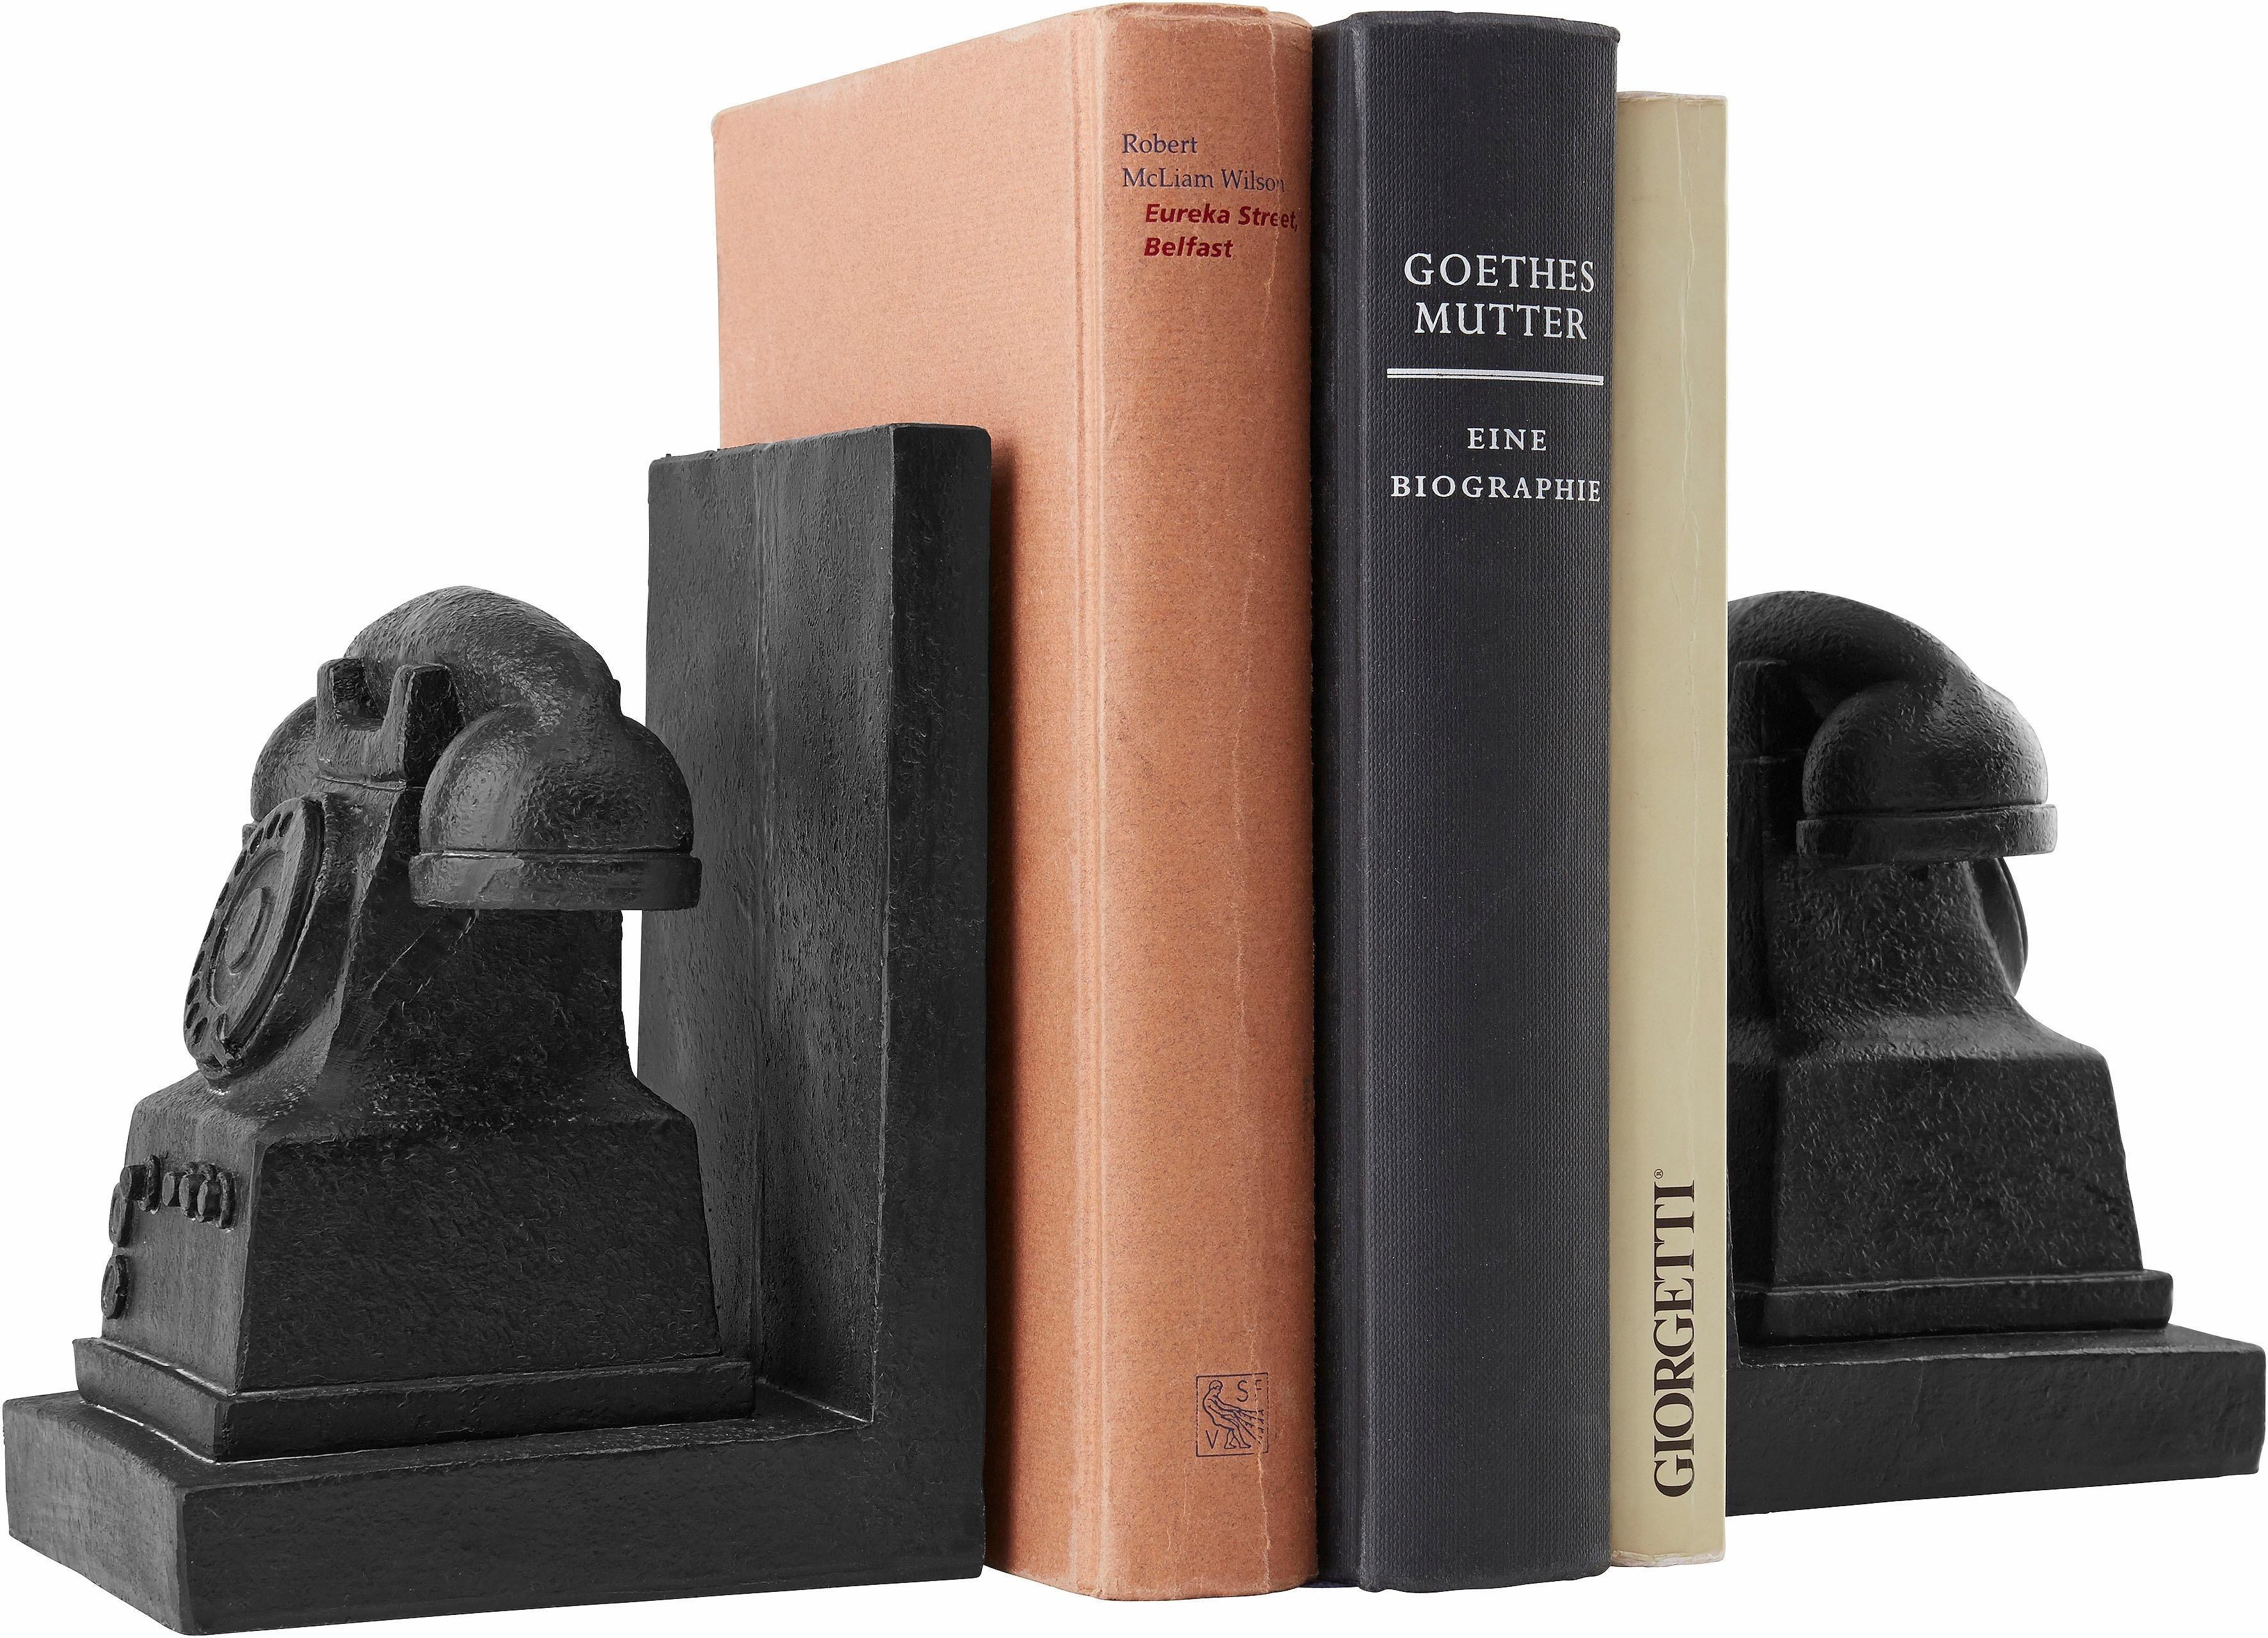 Home affaire Telefon-Buchstützen 16 cm (2-tlg.) | Wohnzimmer > Regale > Hängeregale | Home affaire